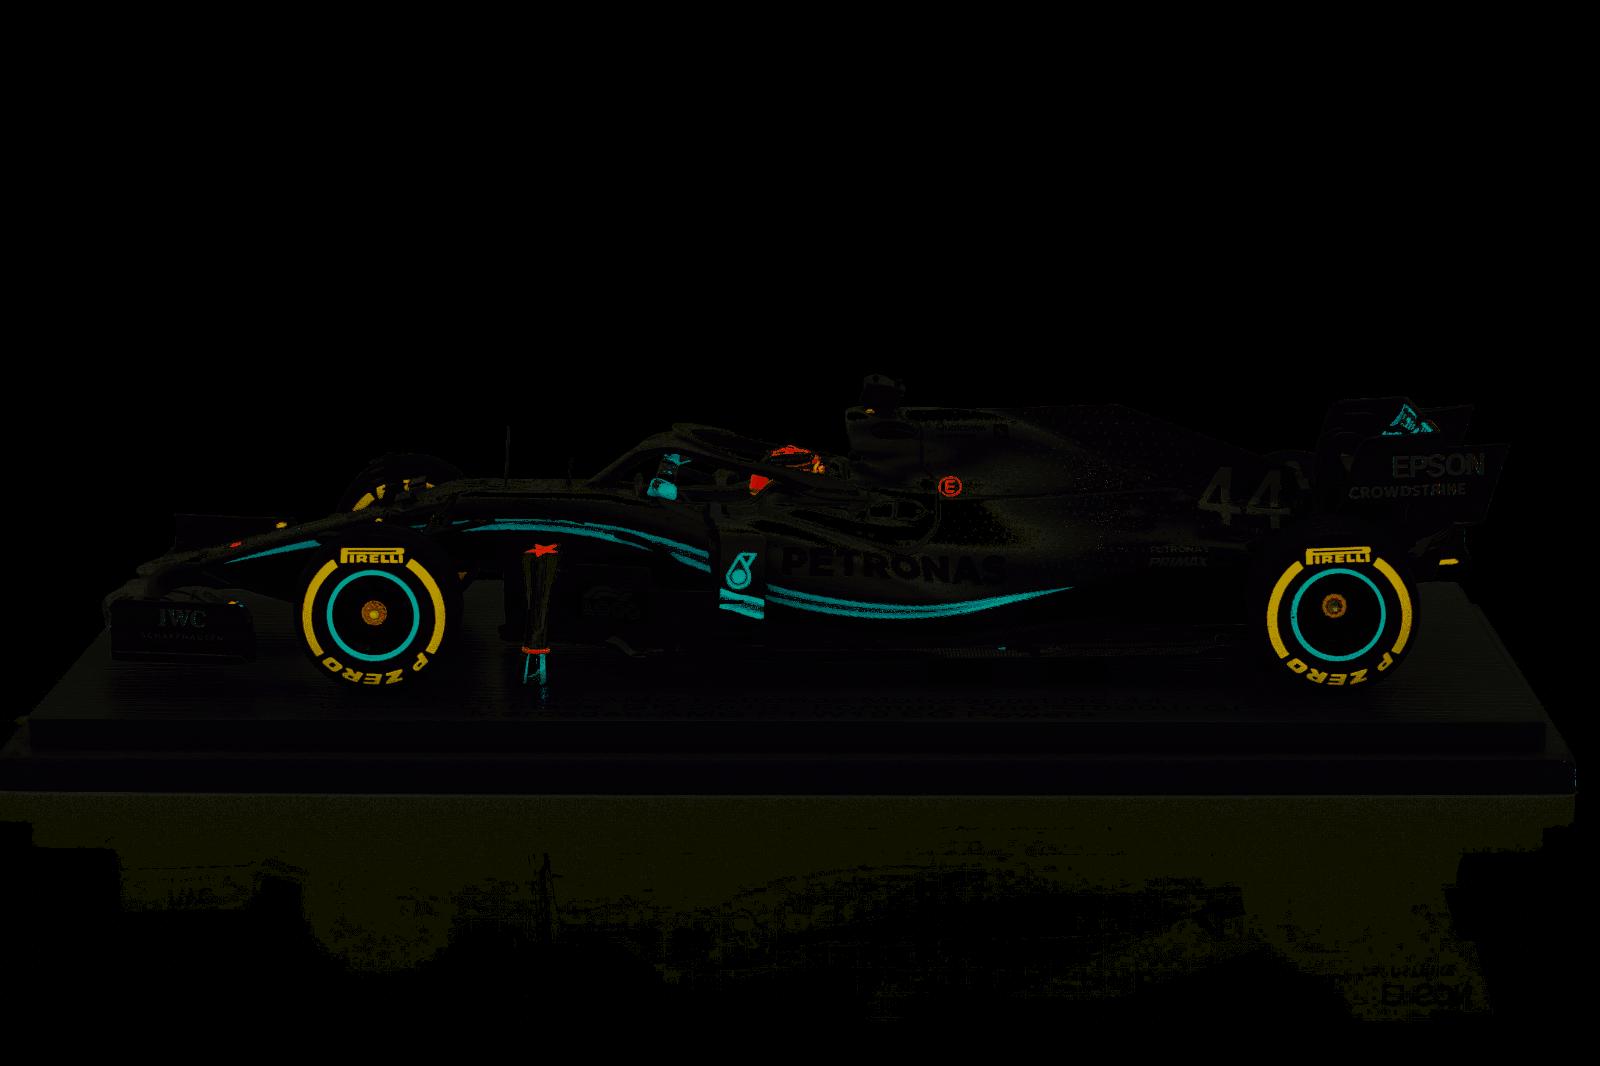 SPARK 1//5 MODELLINO MINIATURA CASCO F1 BOTTAS AUTO MERCEDES AMG 2019 MODELLISMO